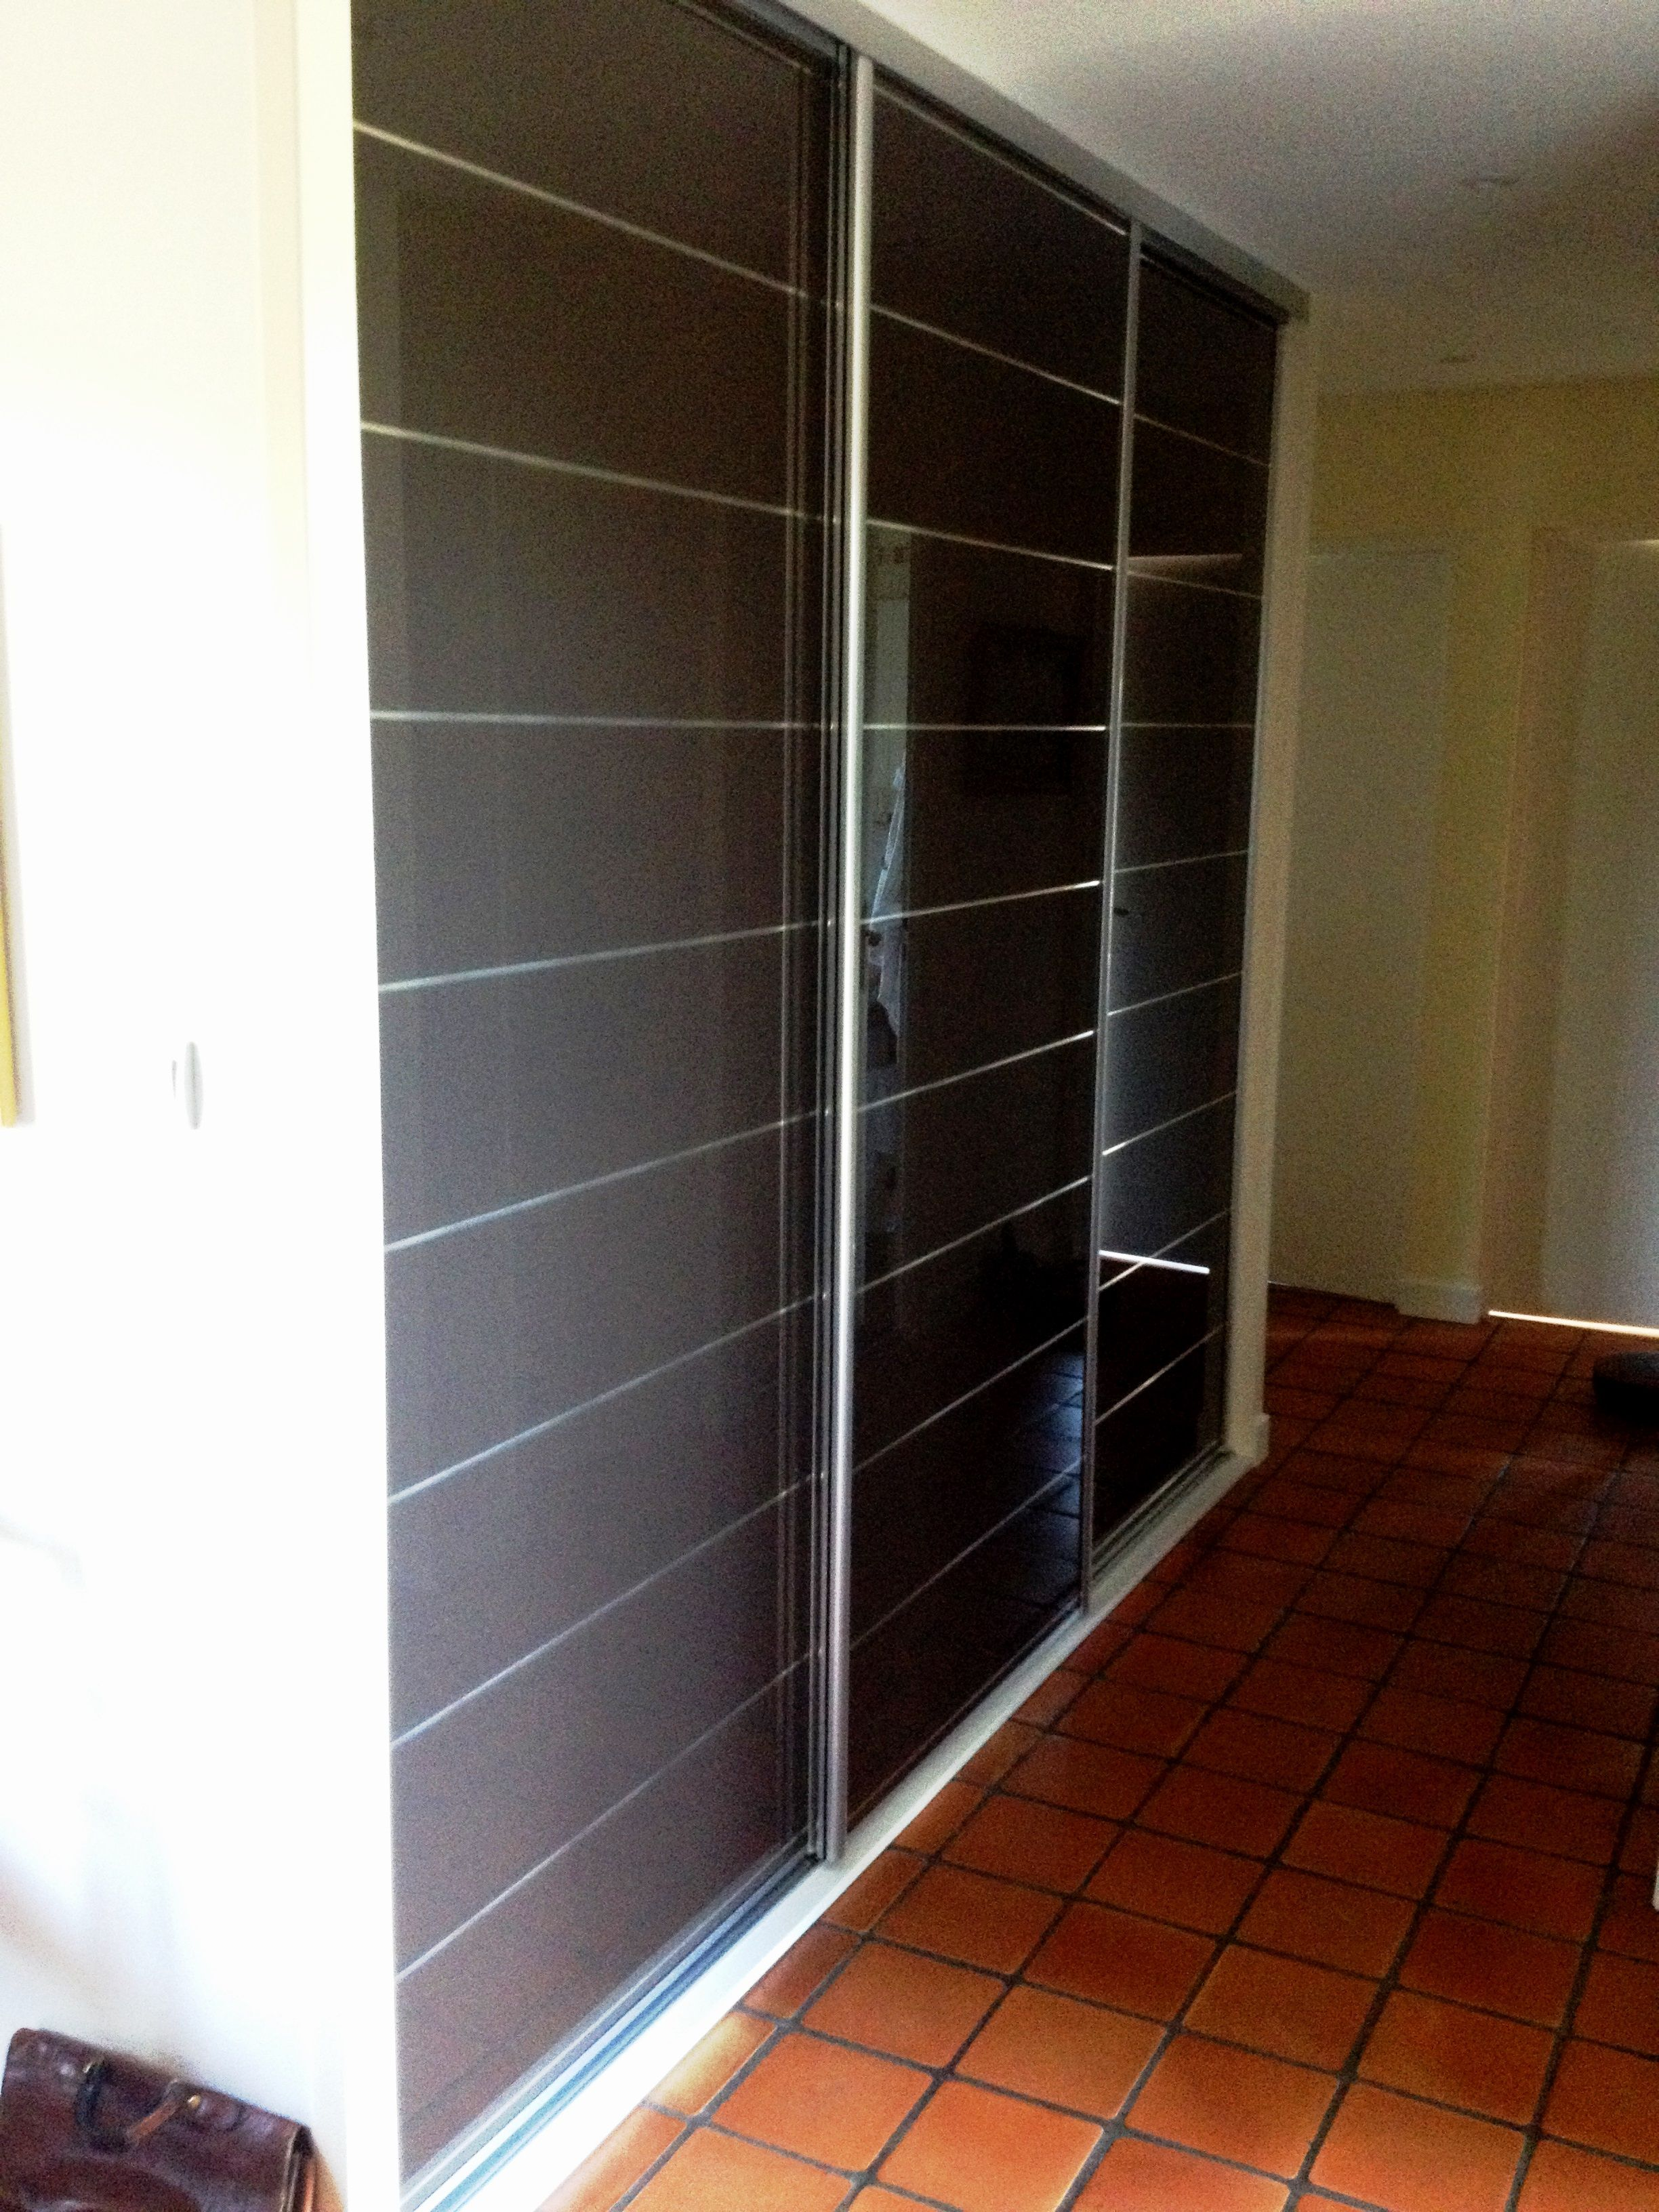 facade verre laqu 3 vantaux incis s chocolat argent placard fa ade coulissante cloison. Black Bedroom Furniture Sets. Home Design Ideas